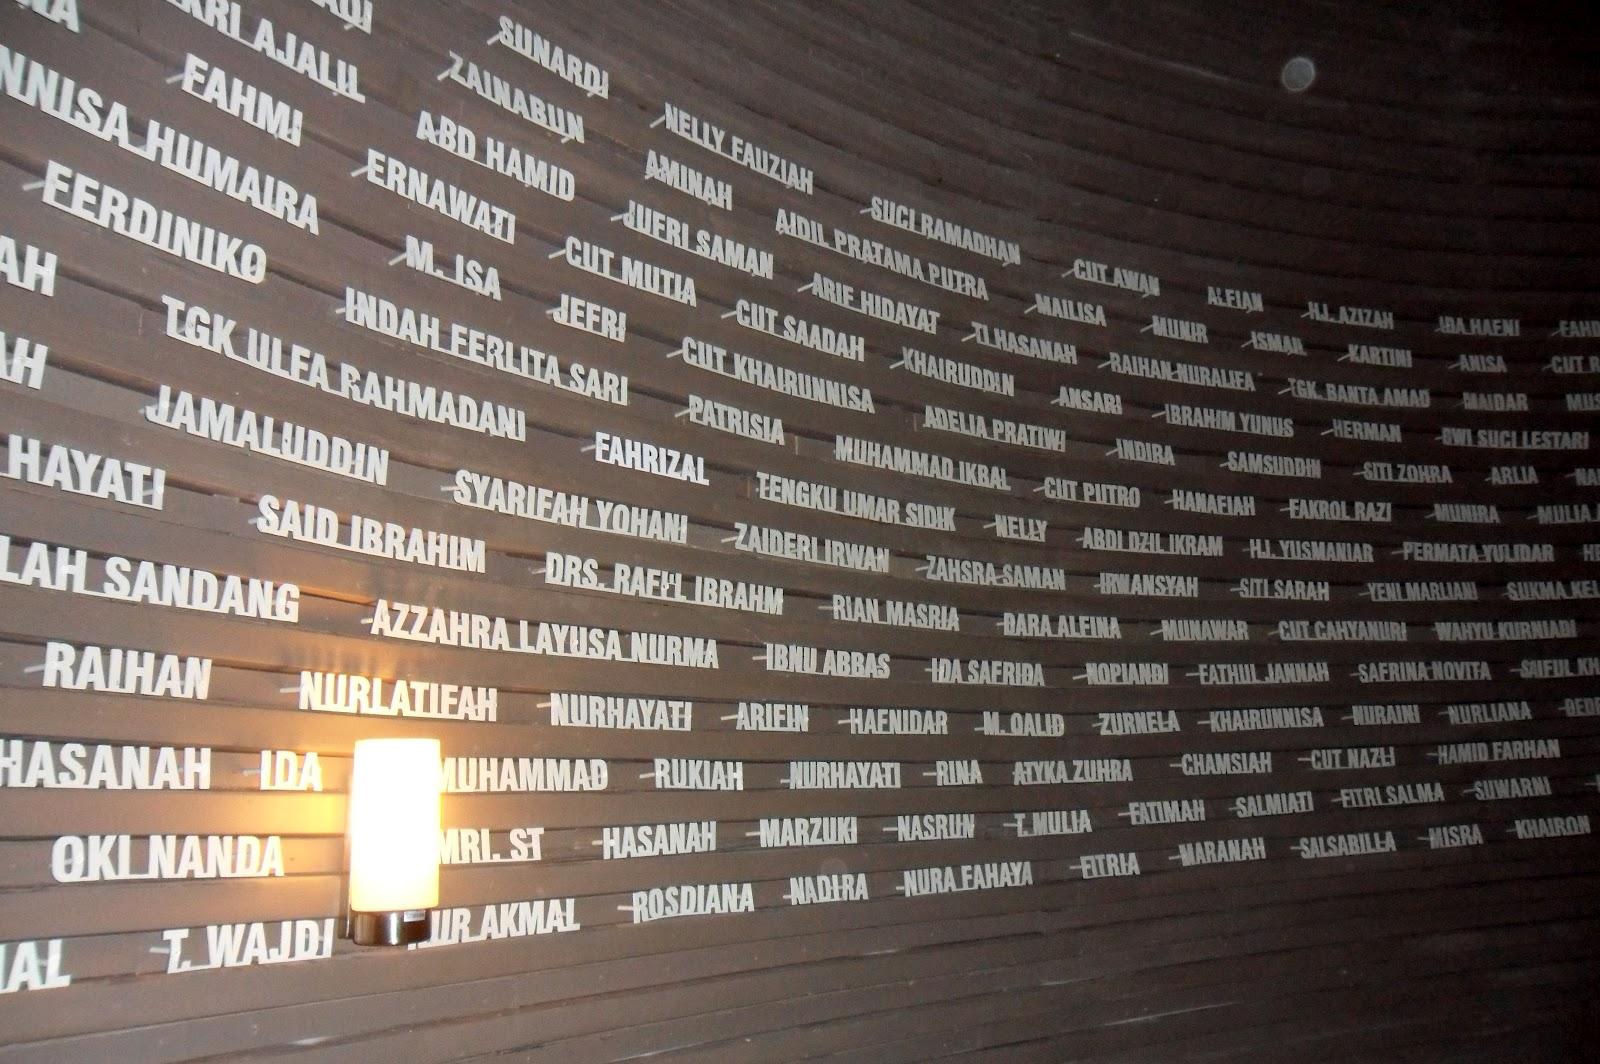 Museum Tsunami Visit Aceh 2014 01 Sumur Doa Musium Kota